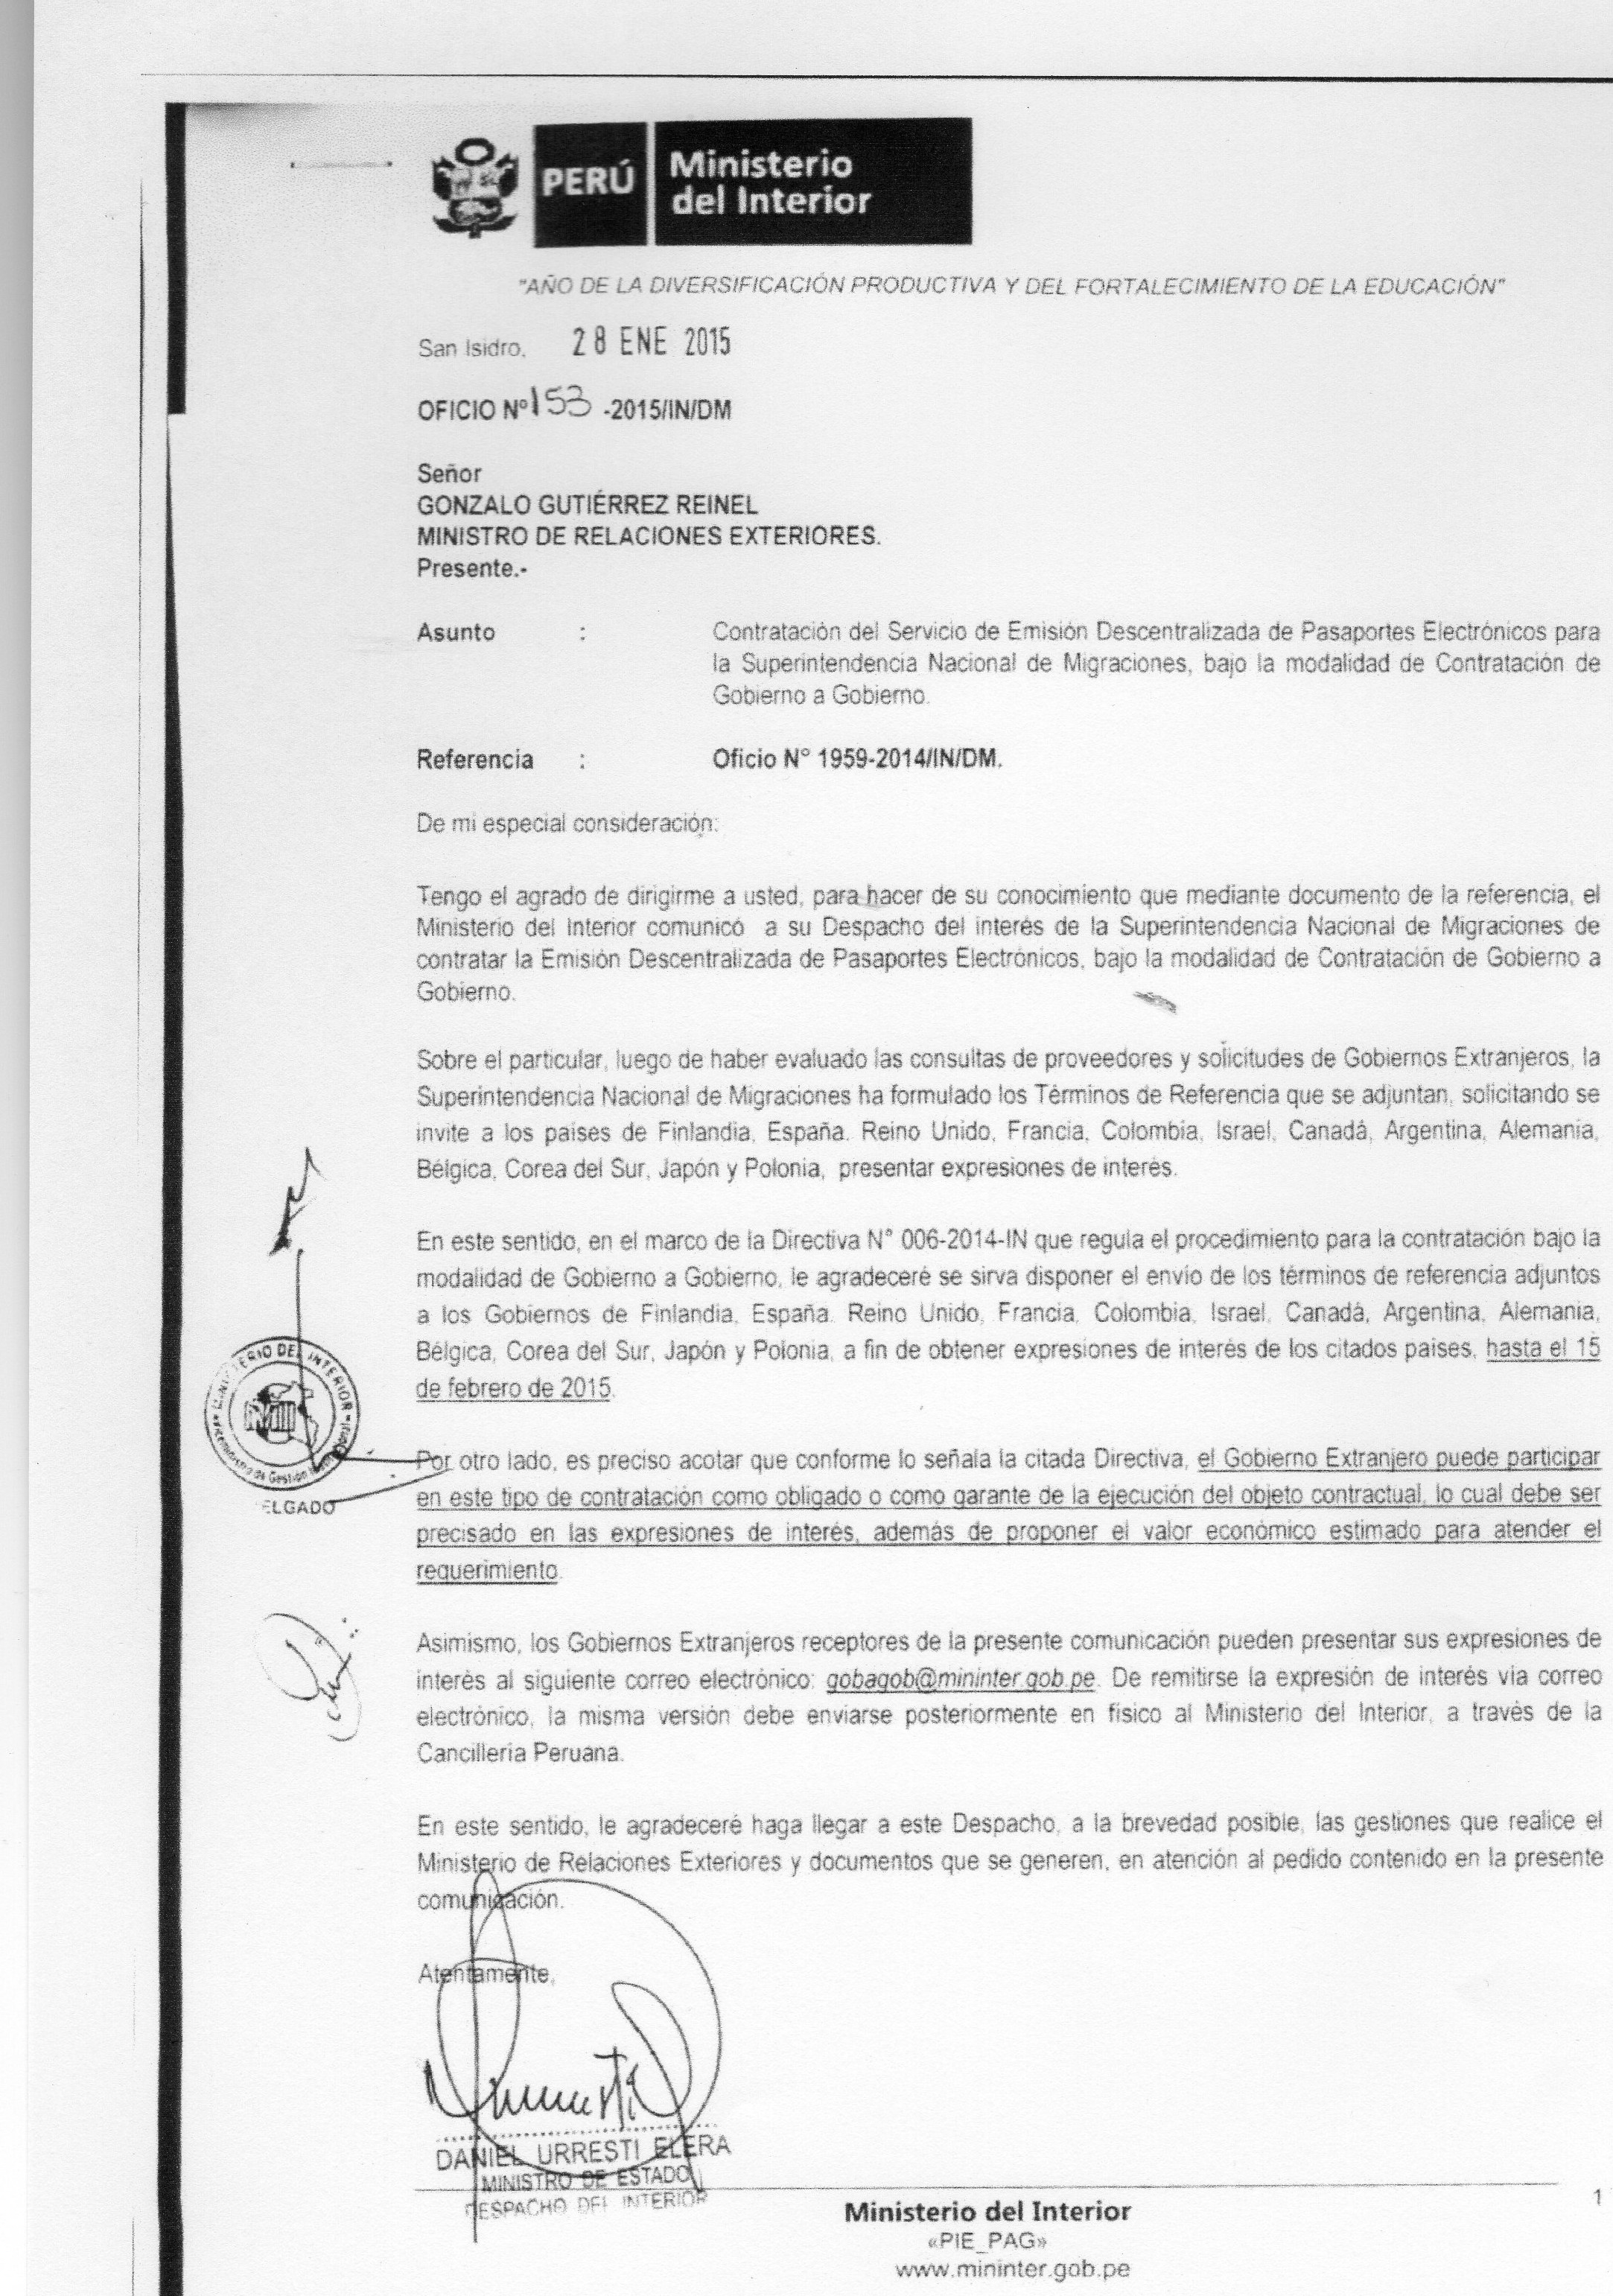 Confirmado pasaportes electr nicos de gobierno a for Ministerio interior pasaporte